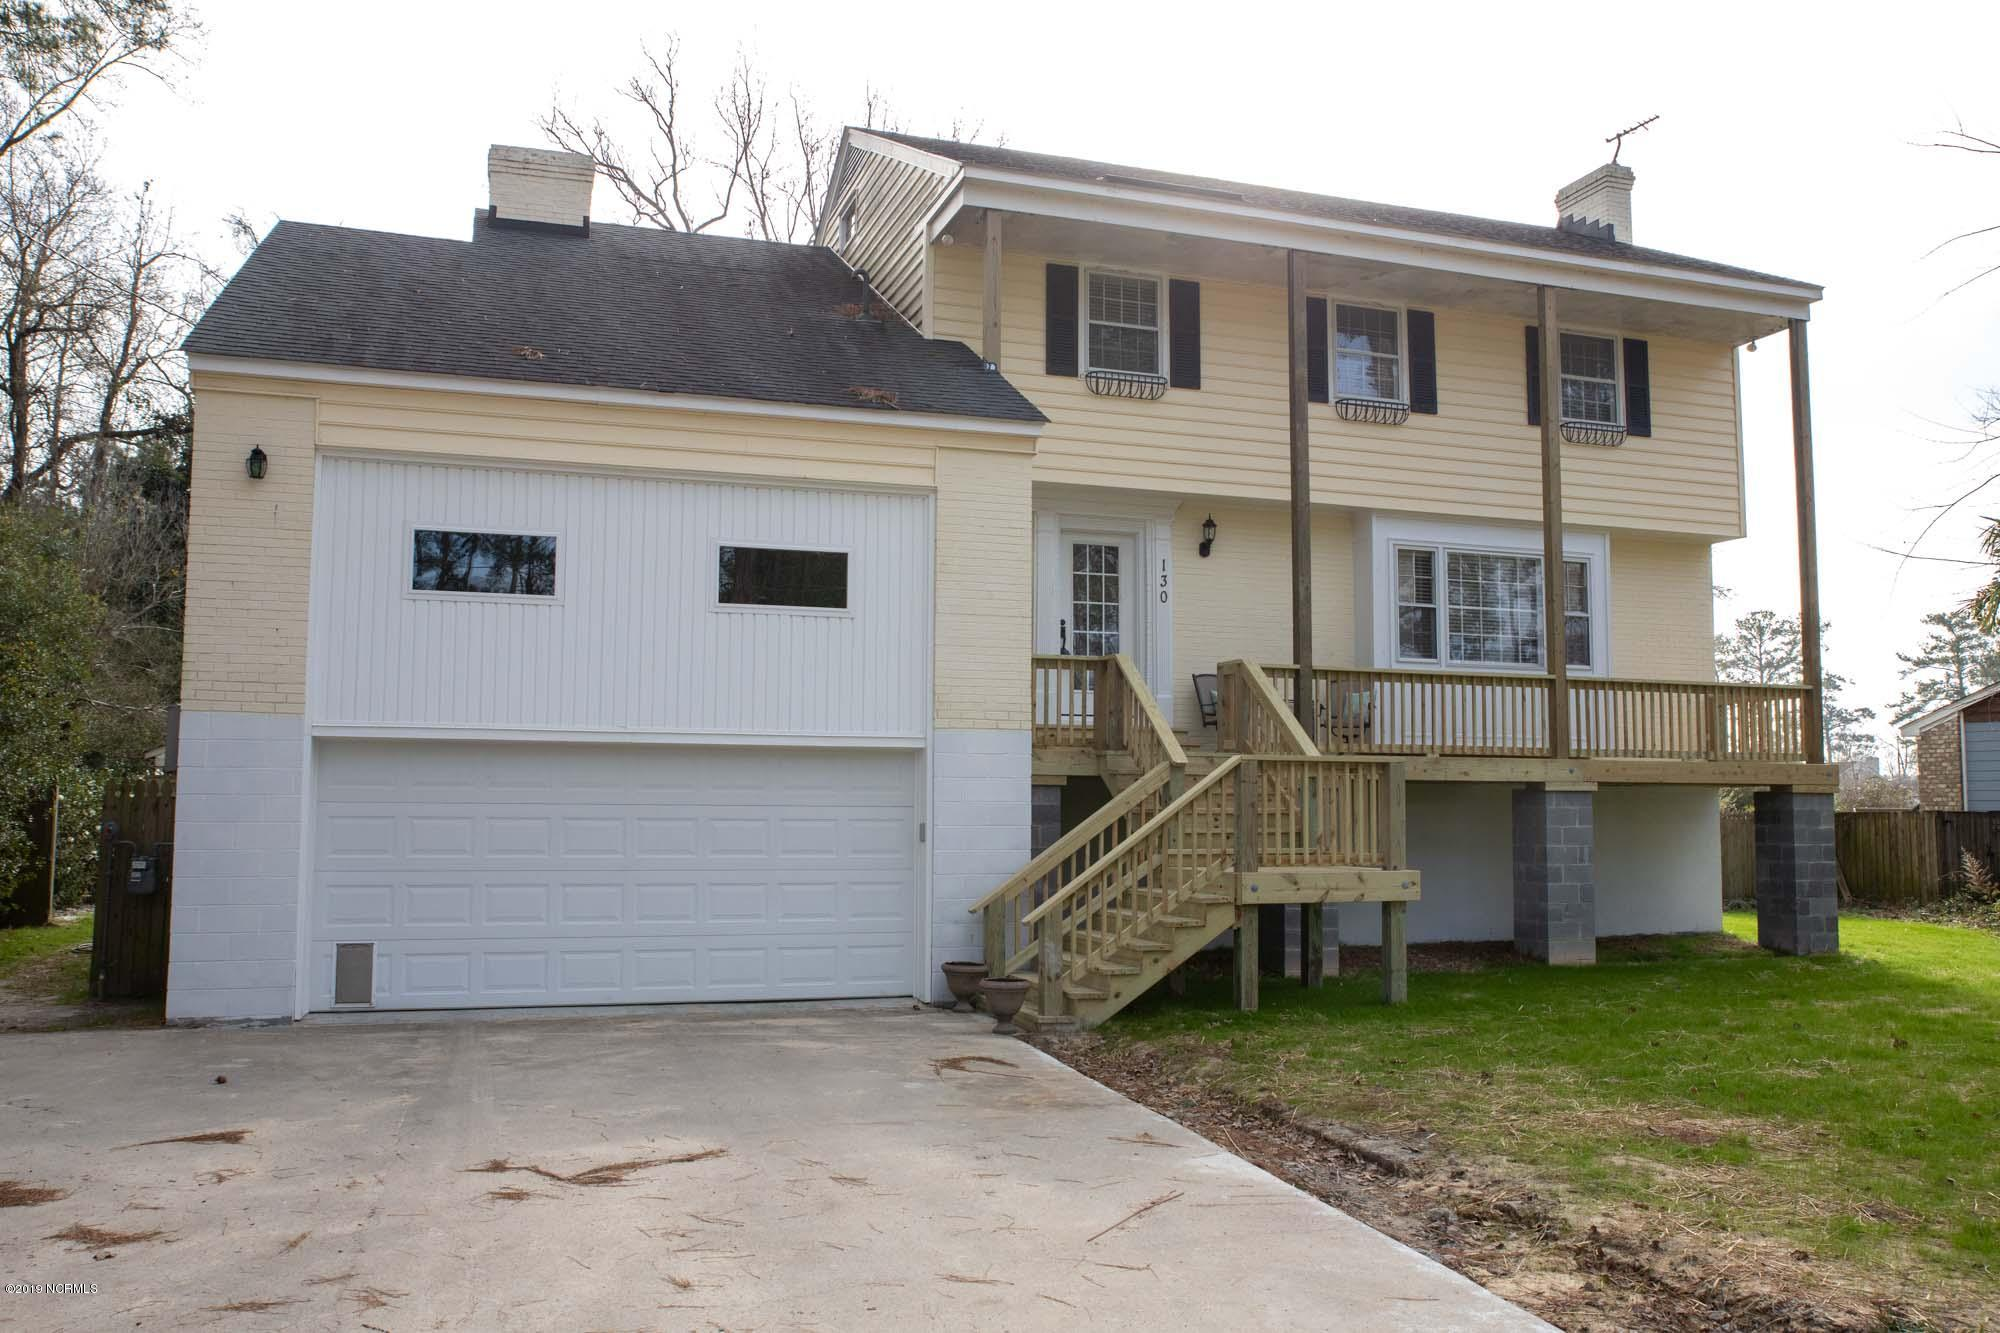 130 Spruce Street, Washington, North Carolina, 3 Bedrooms Bedrooms, 9 Rooms Rooms,3 BathroomsBathrooms,Single family residence,For sale,Spruce,100153632